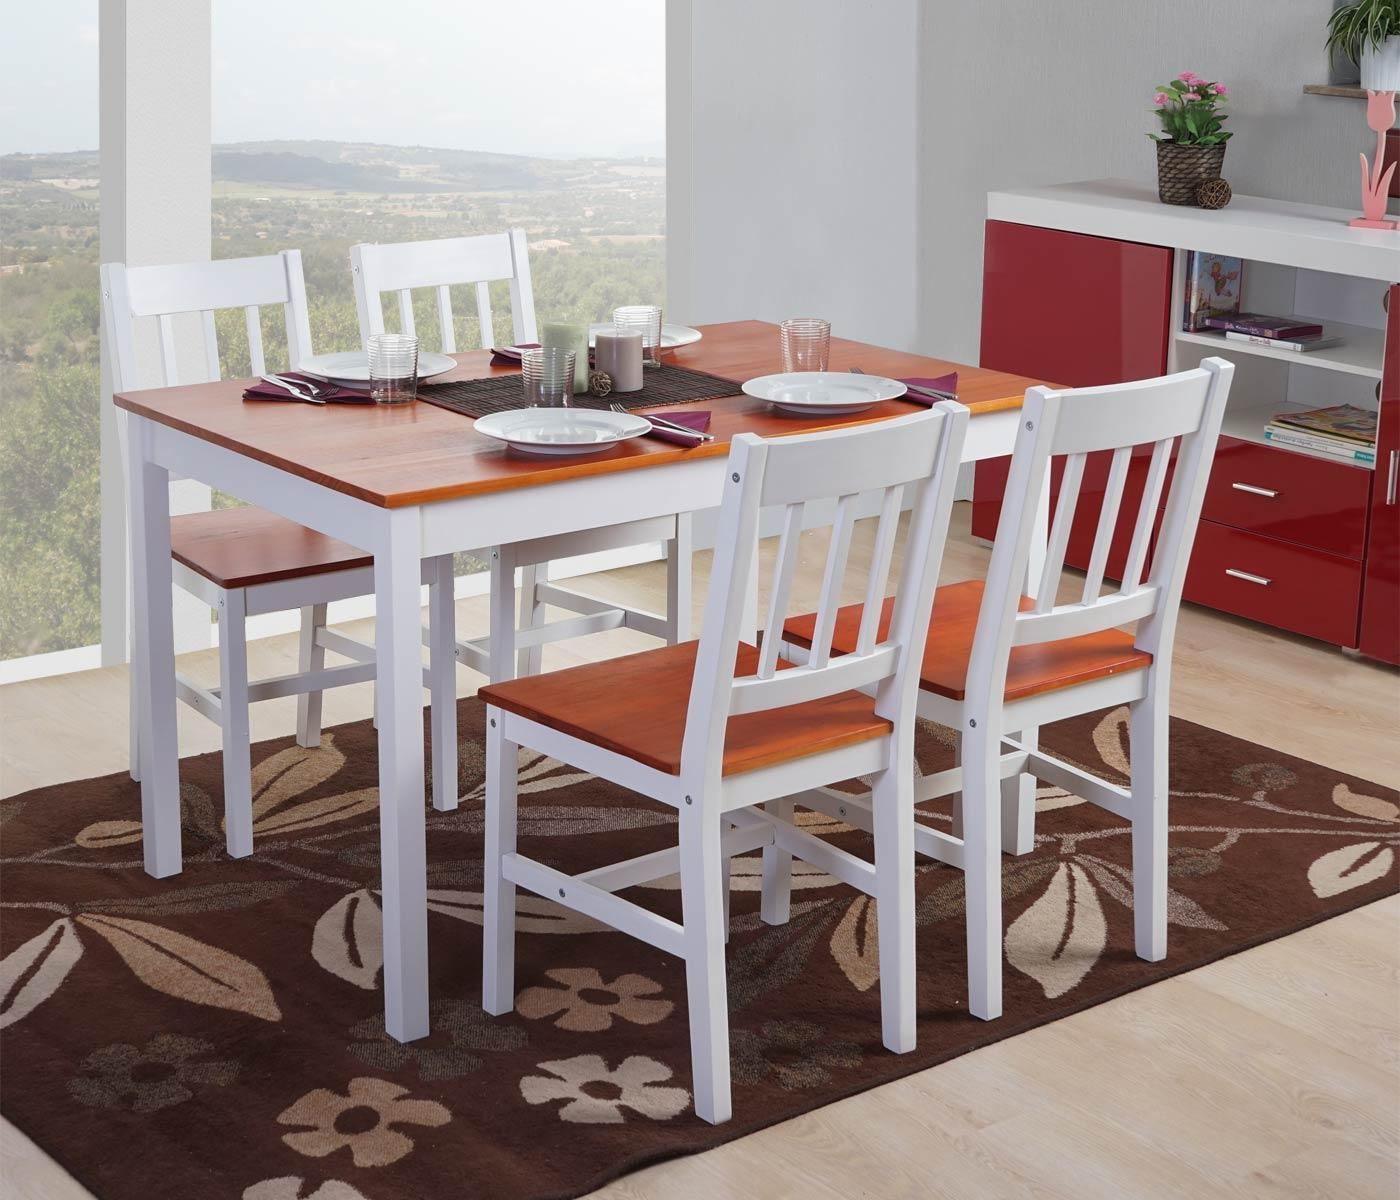 Conjunto mesa 4 sillas de cocina o comedor nerja en for Sillas para cocina comedor